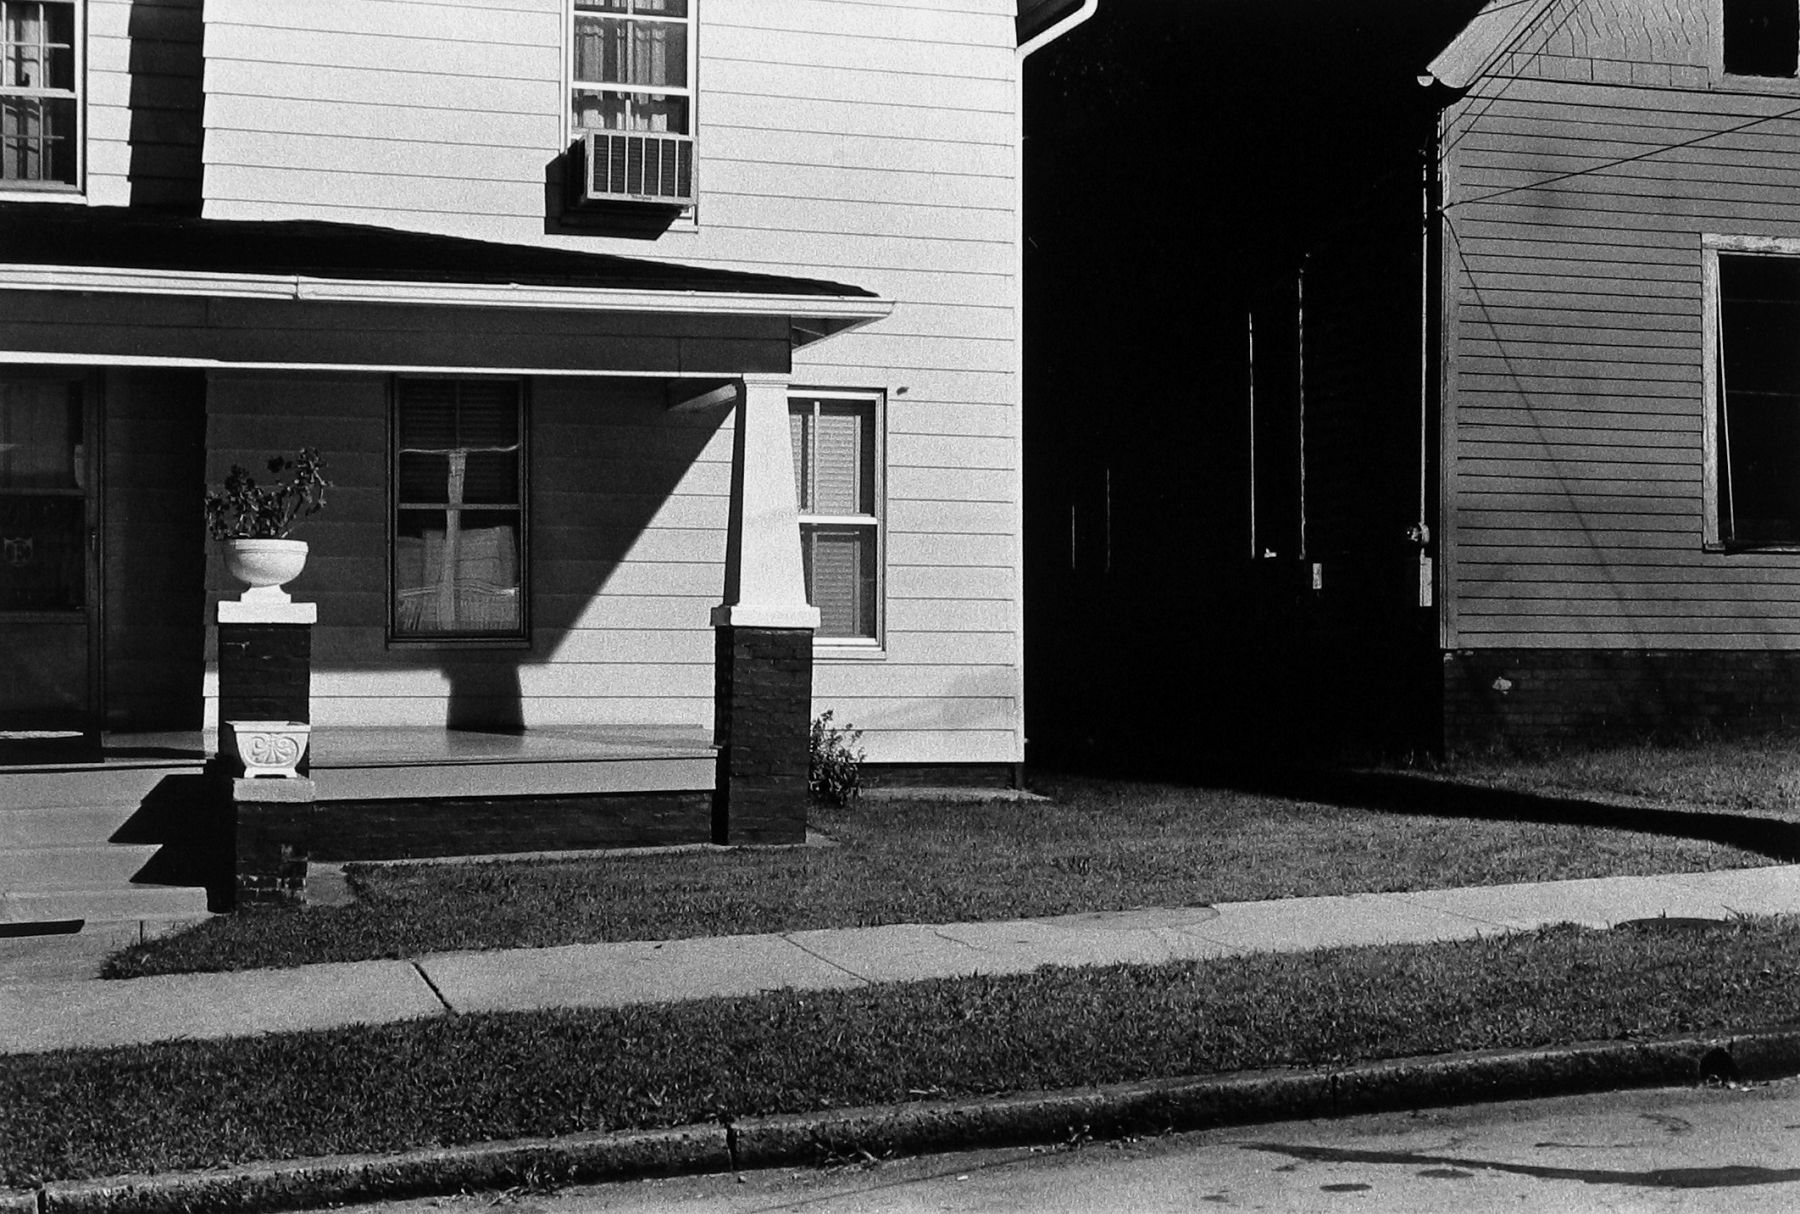 William Gedney - Knoxville, TN, 1972 - Howard Greenberg Gallery - 2018